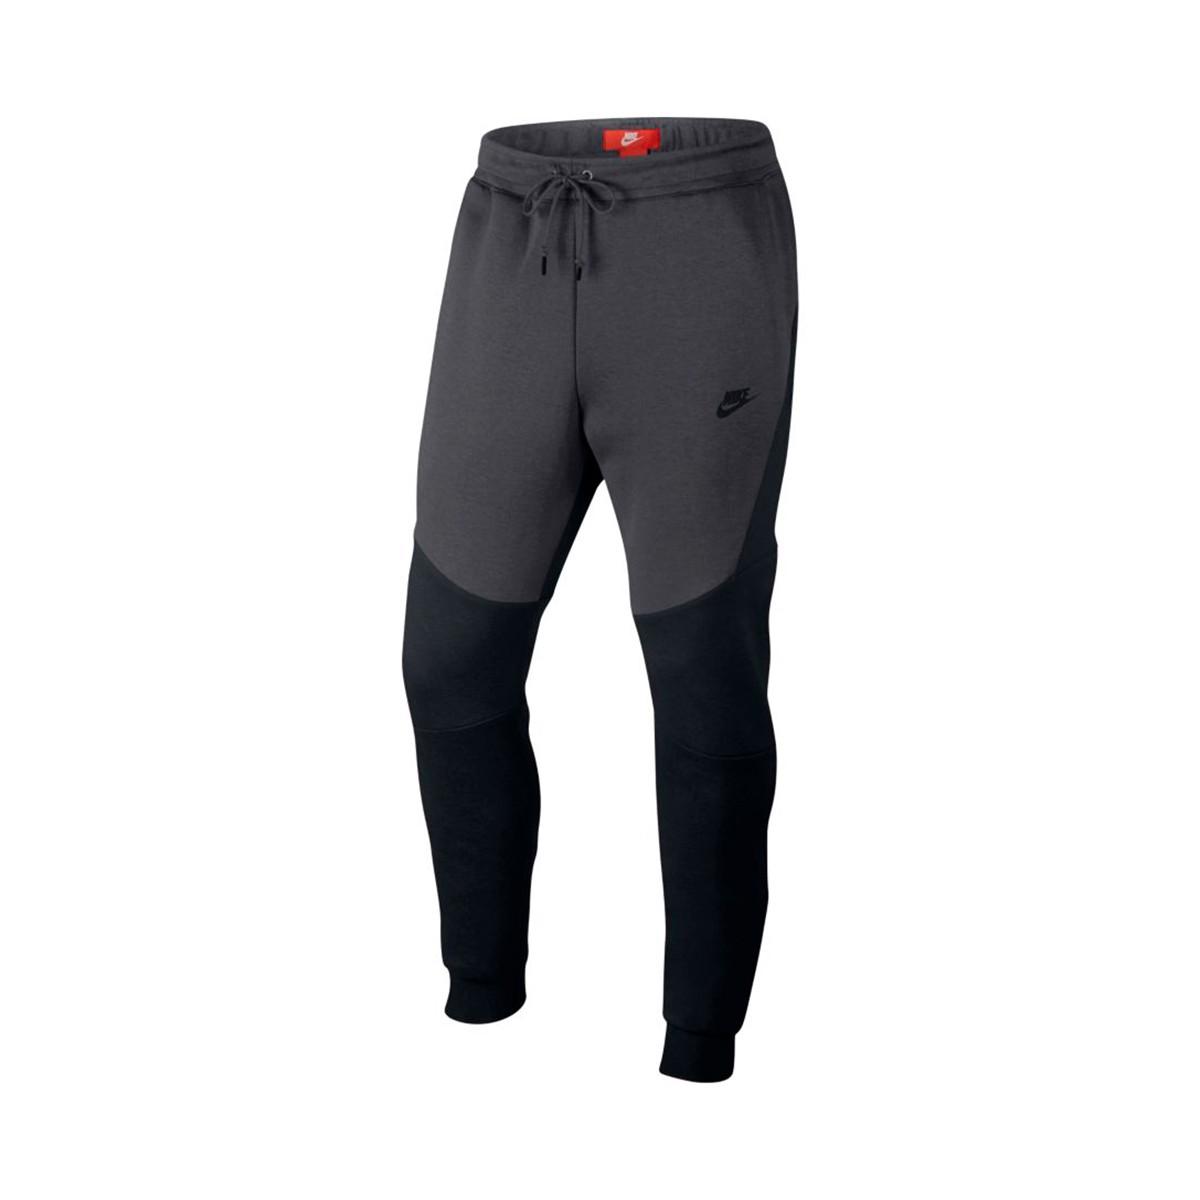 Long Pants Nike Sportswear Tech Fleece Jogger 2019 Black Anthracite Black Football Store Futbol Emotion